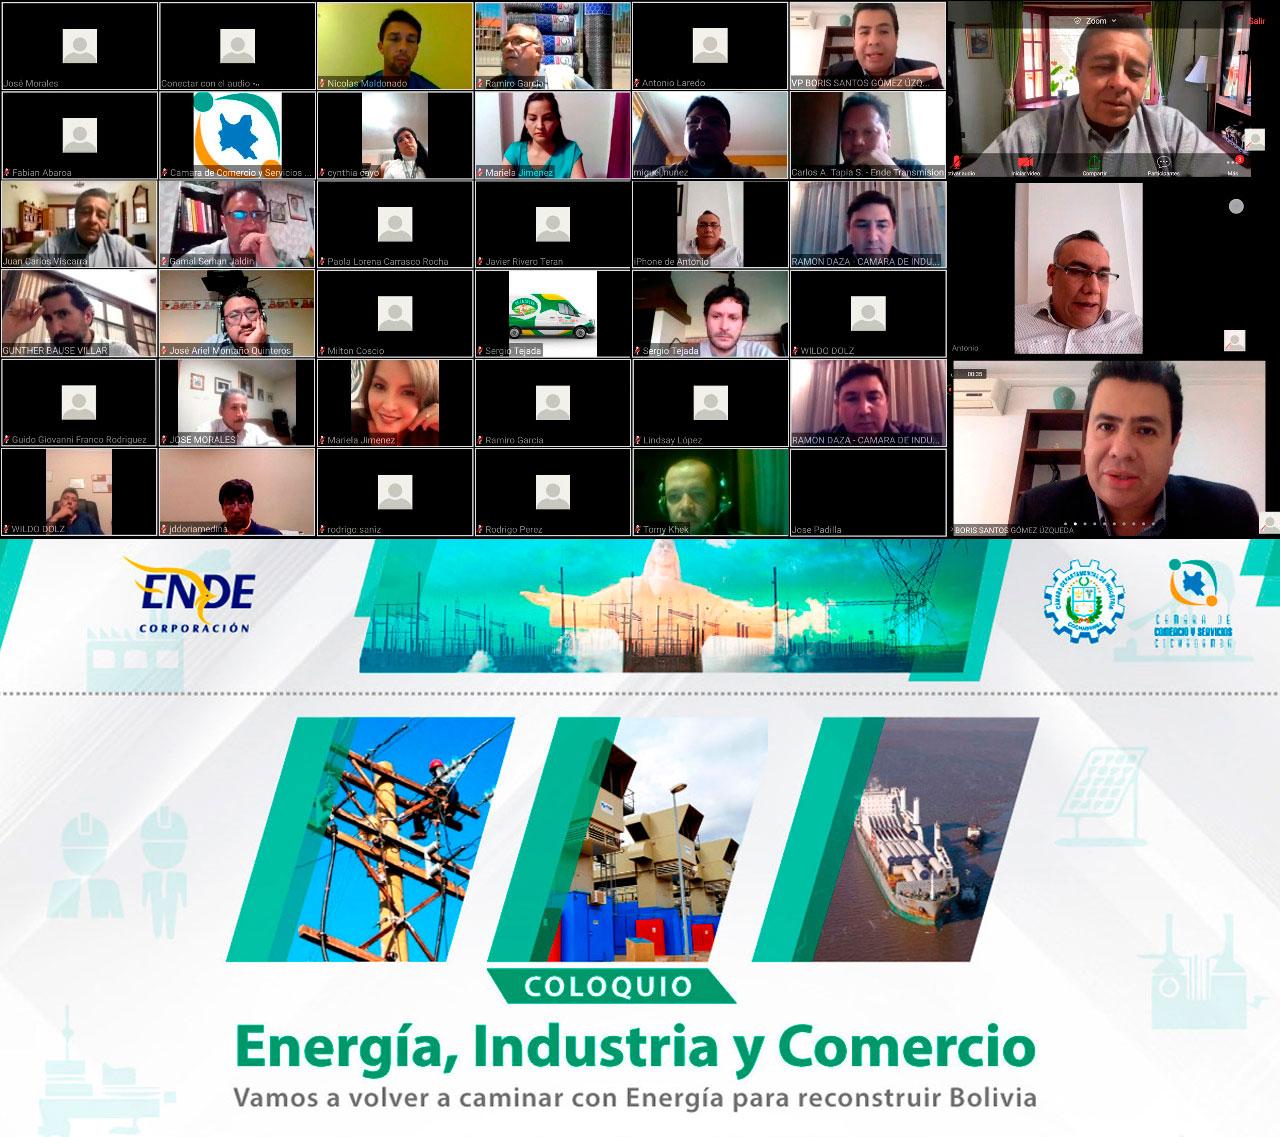 Ende corporación genera lazos con empresarios de cochabamba